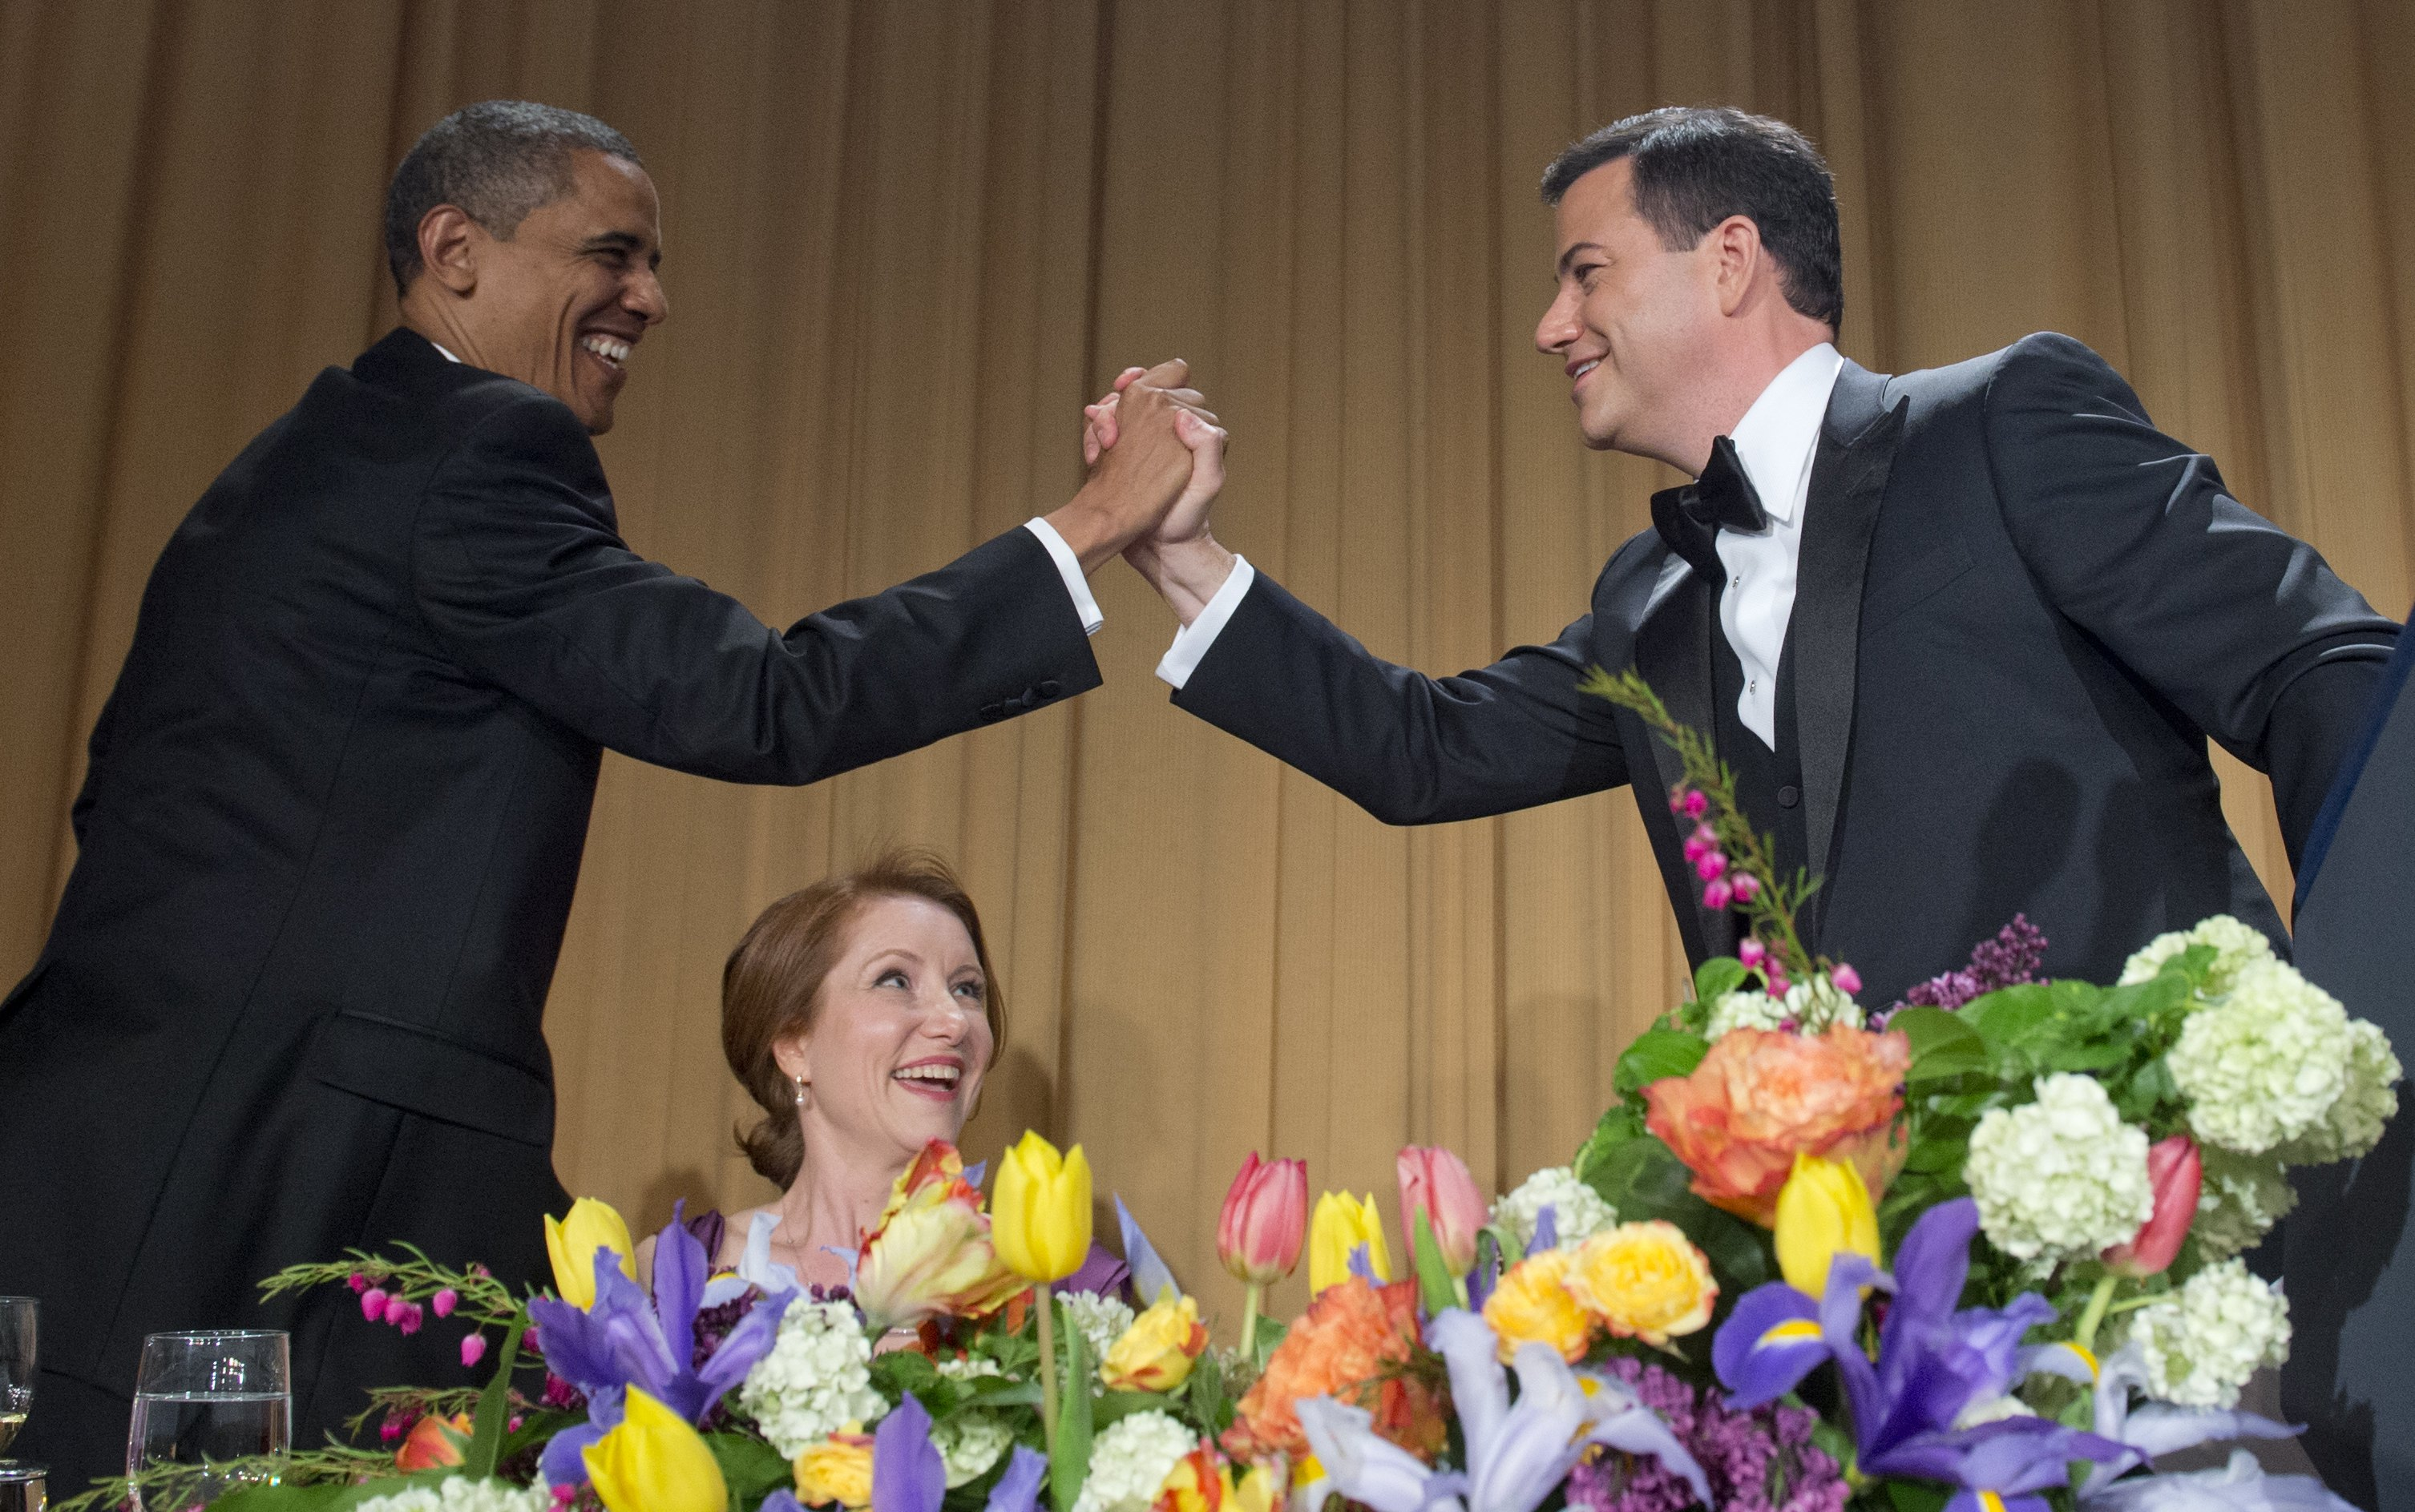 US President Barack Obama high-fives television host Jimmy Kimmel (R) during the White House Correspondents Association Dinner in Washington on April 28, 2012.